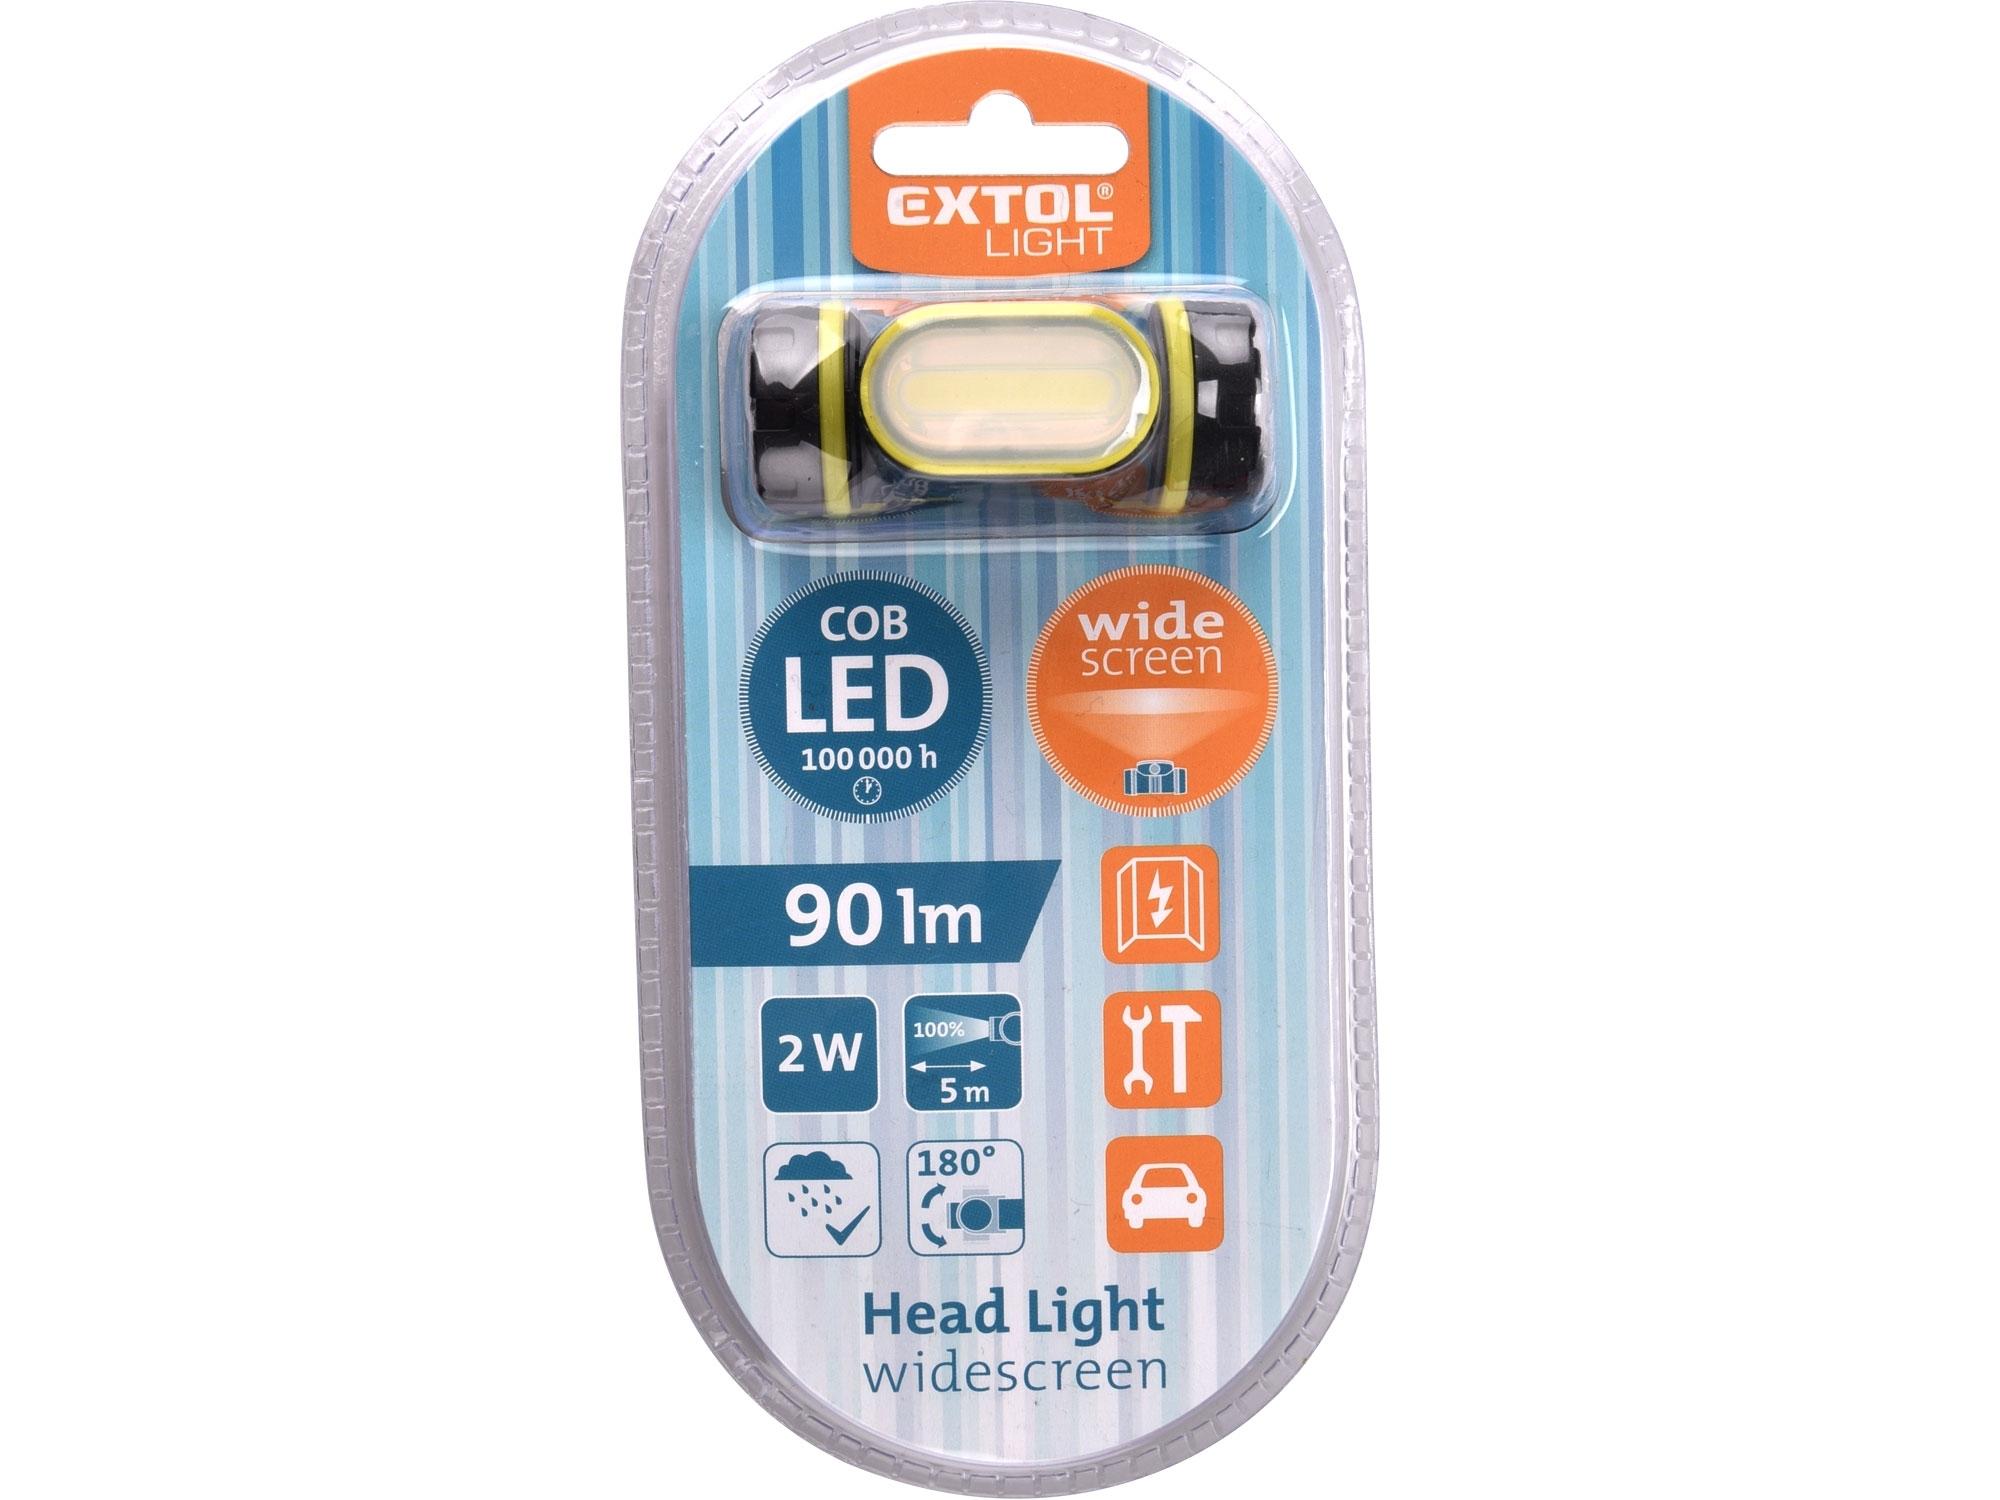 Čelovka širokoúhlá 90lm COB,2W LED EXTOL